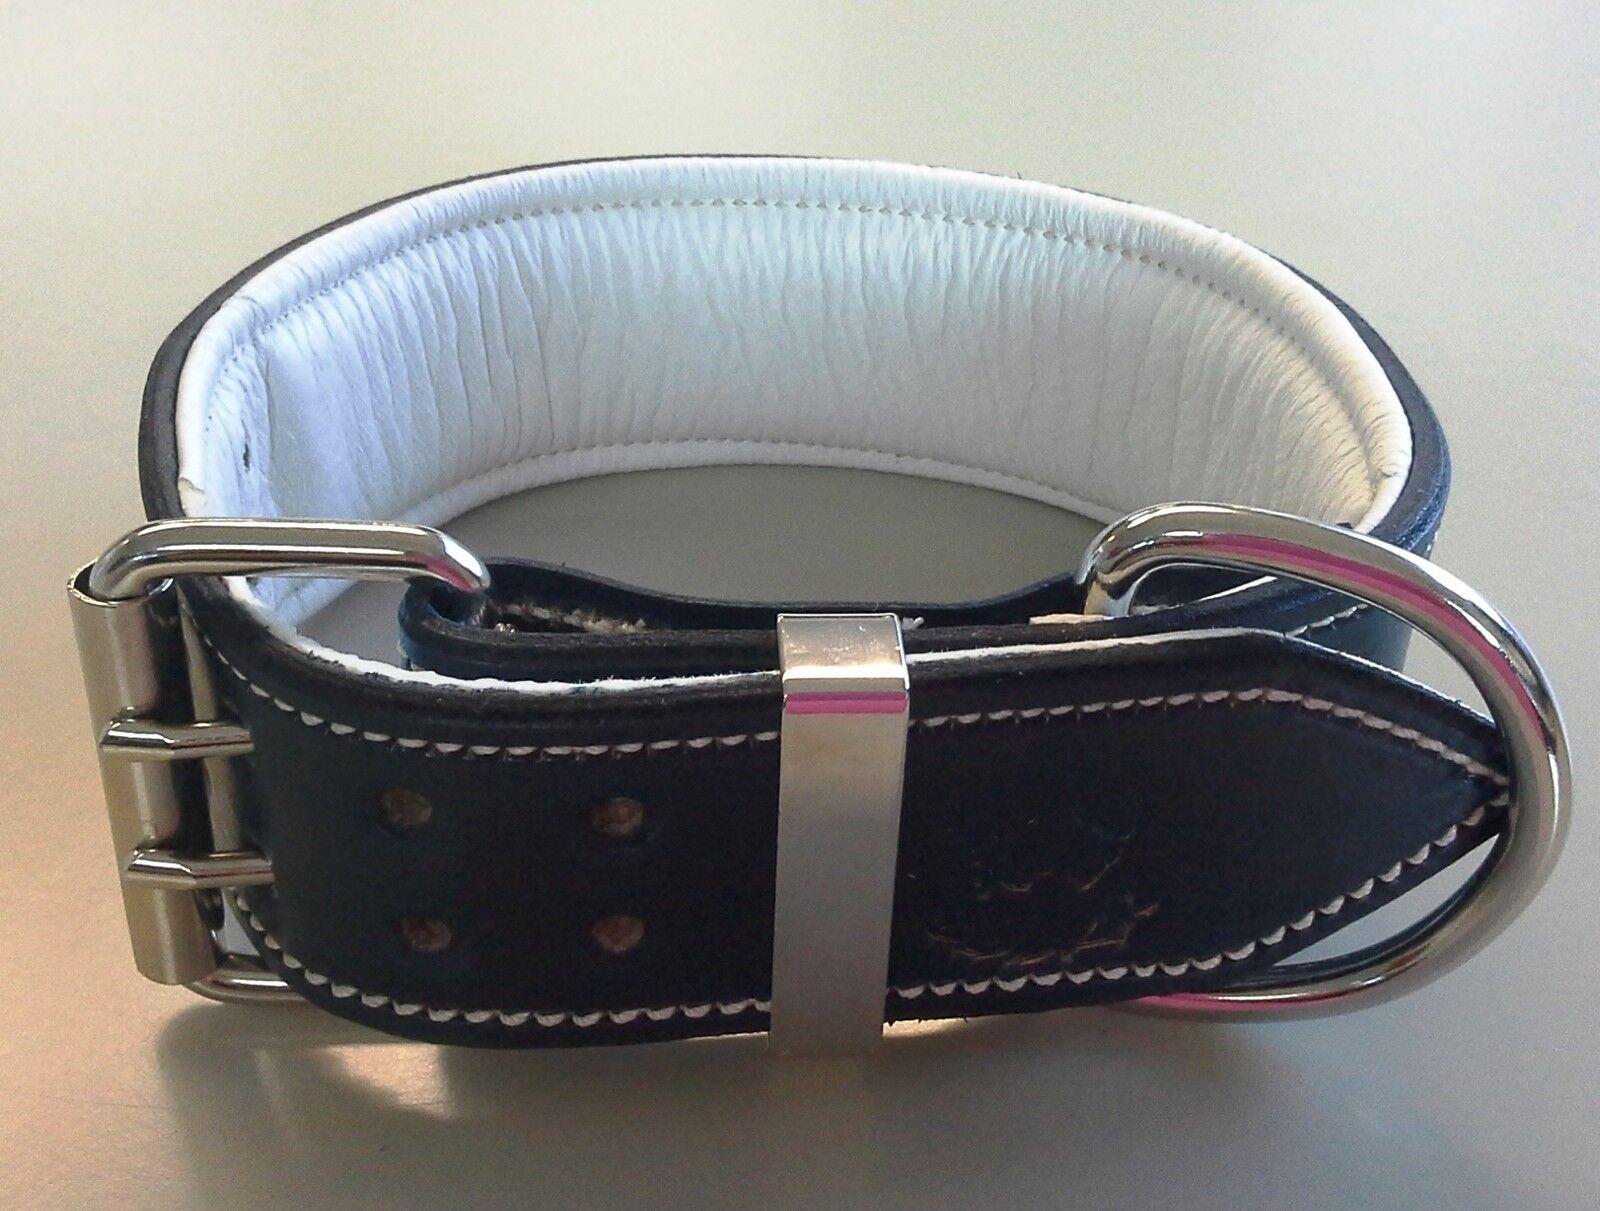 XX-Large Navy Blau Leather Dog Collar with Soft Weiß Weiß Weiß Leather Inner Lining 309030